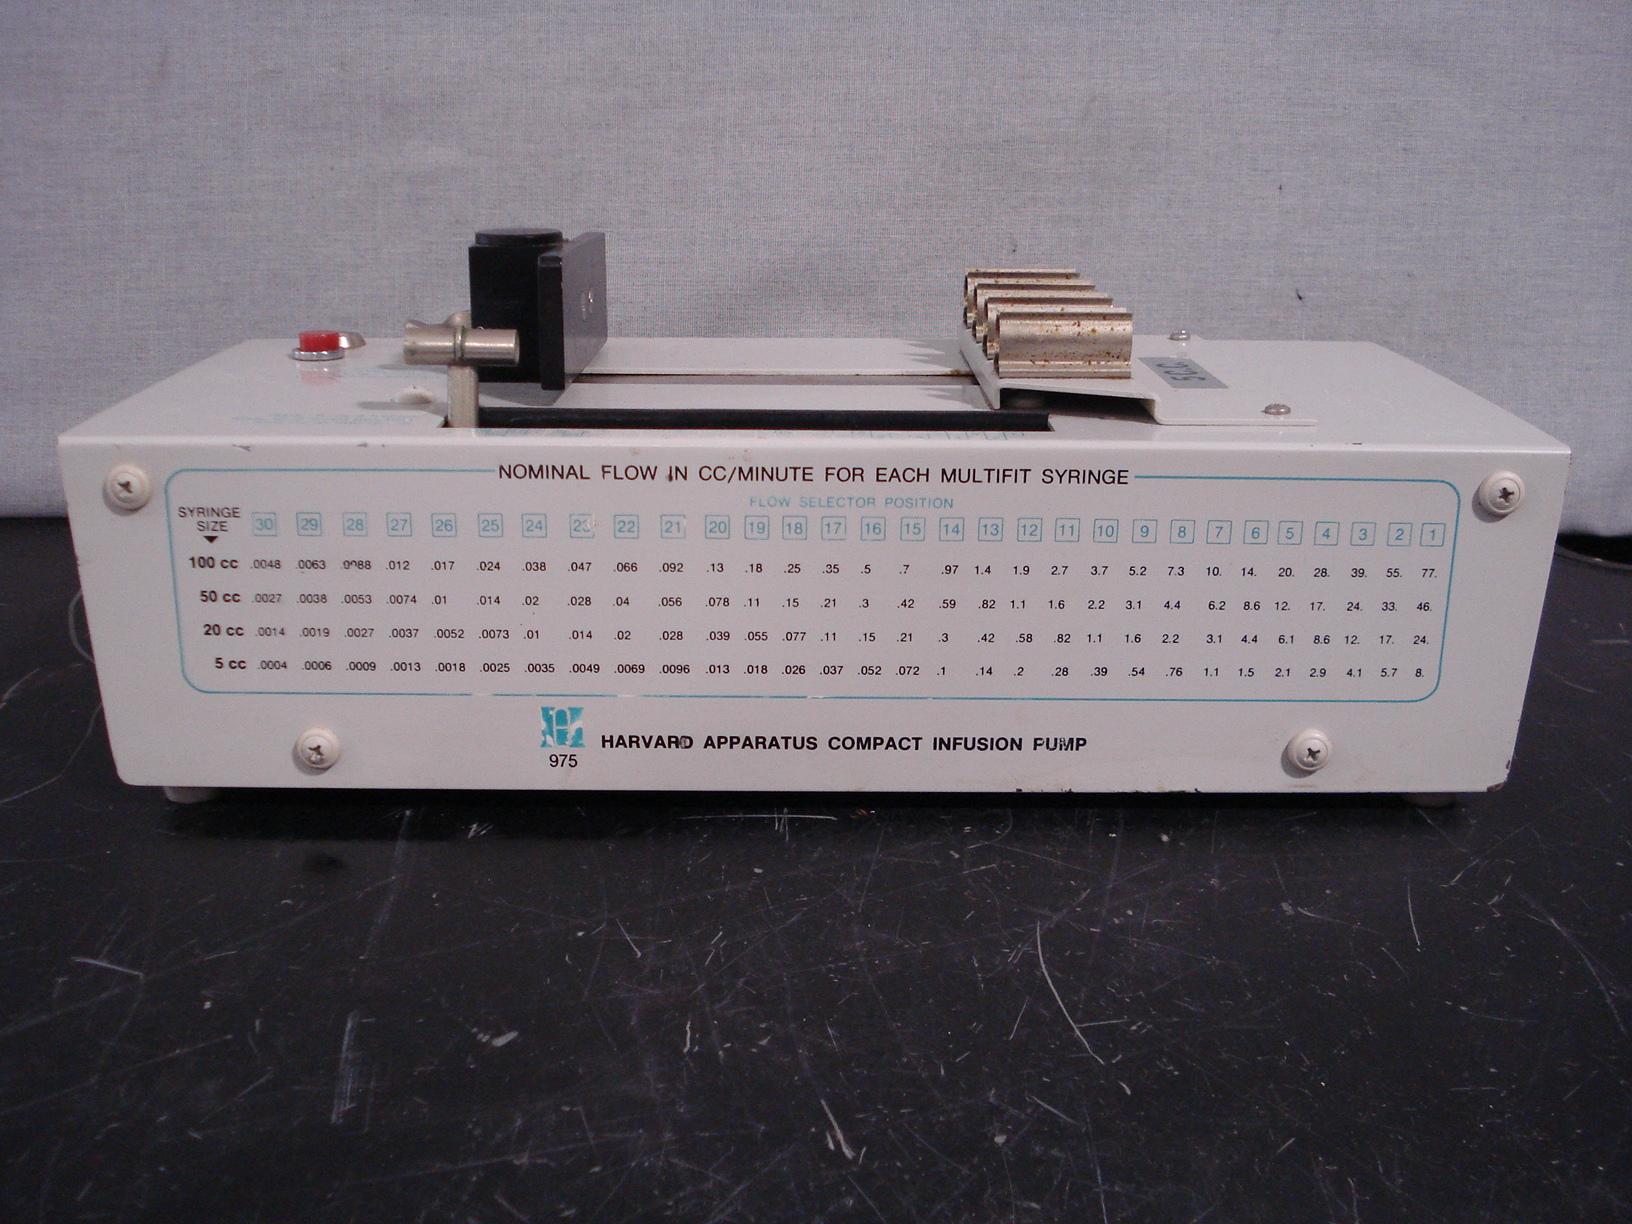 Harvard Apparatus Apparatus Compact Infusion Pump Model 975 Image